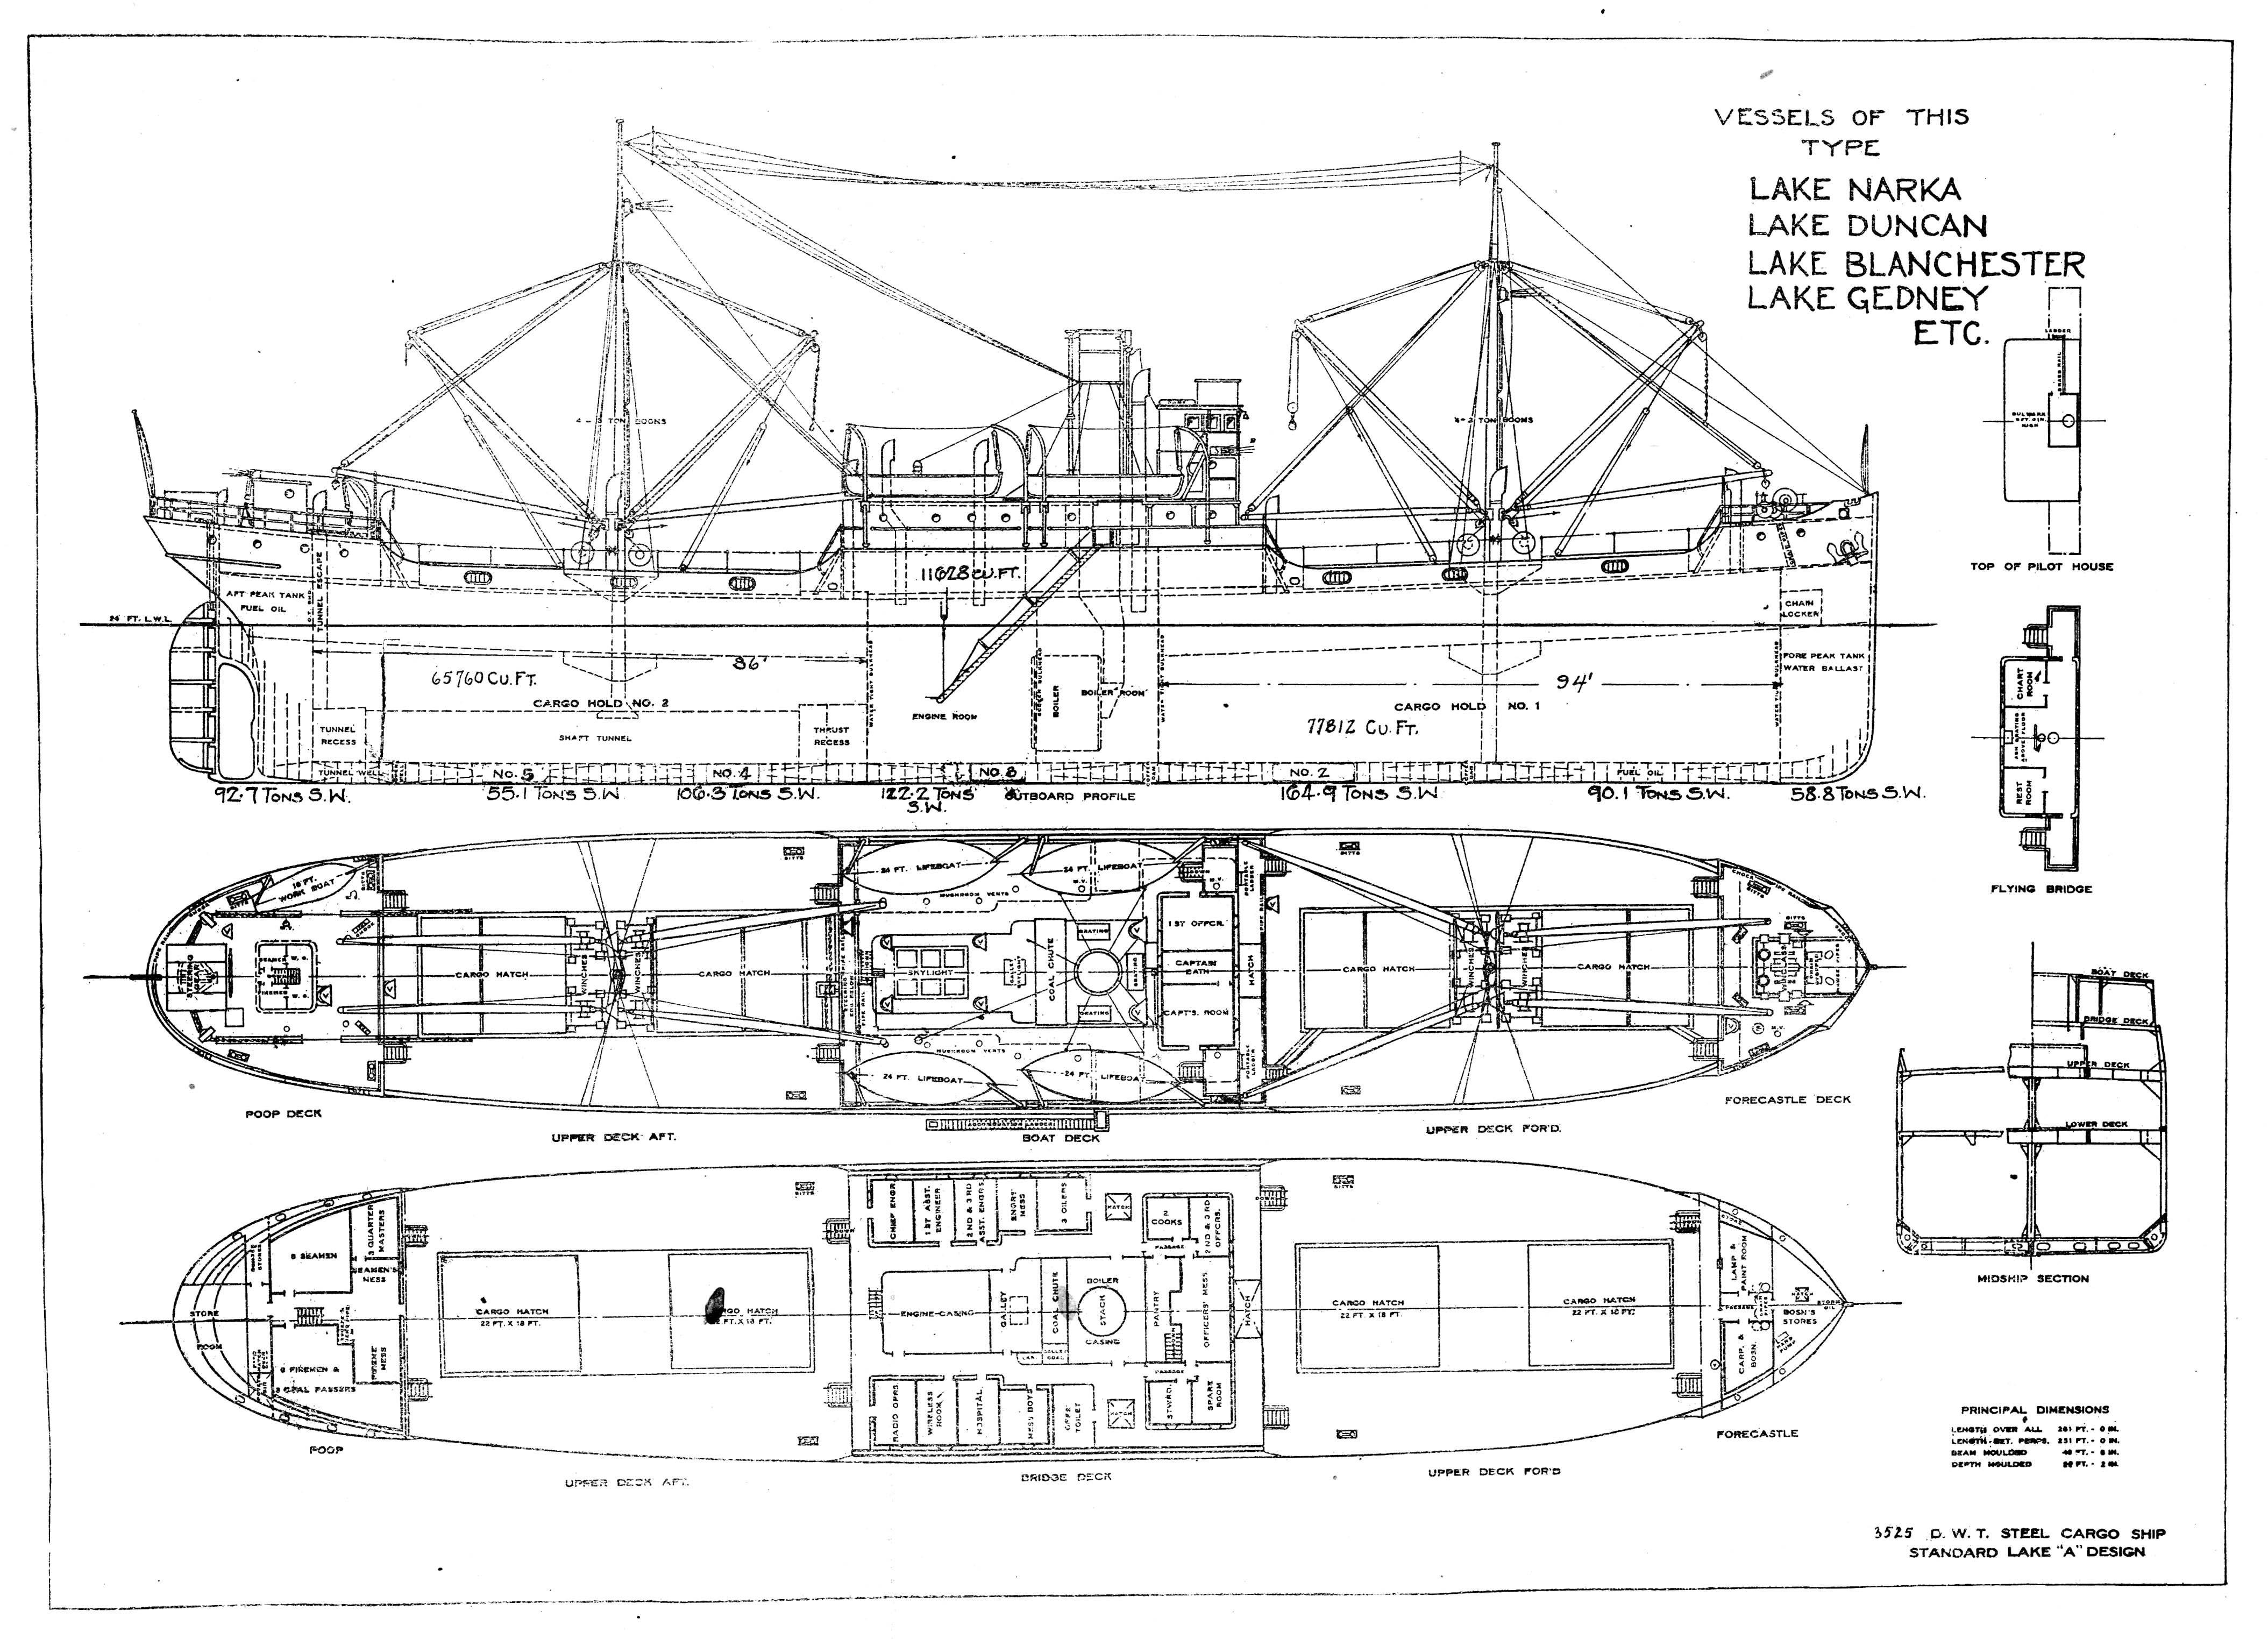 ussb ship register  august 1  1920  plan